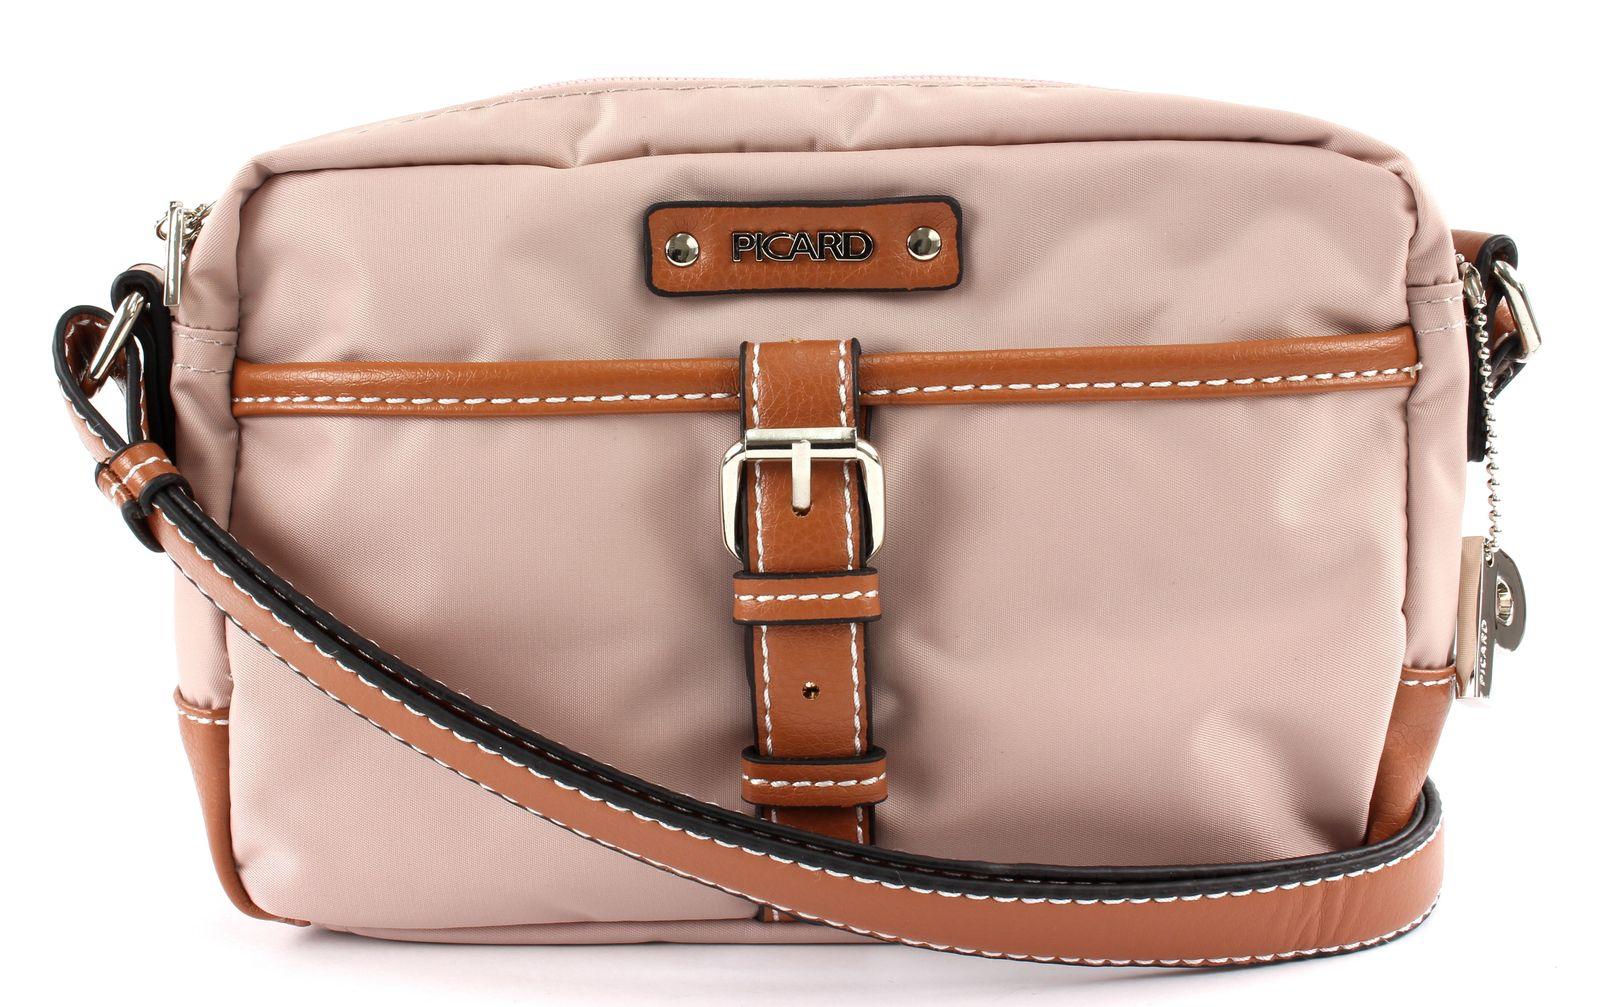 591d45ae9a8d9 ... ÜberweisungTap To ClosePICARD Sonja Crossover Bag PowderTap To CloseNur  möglich bei sofortigem Zahlungseingang mit Paypal